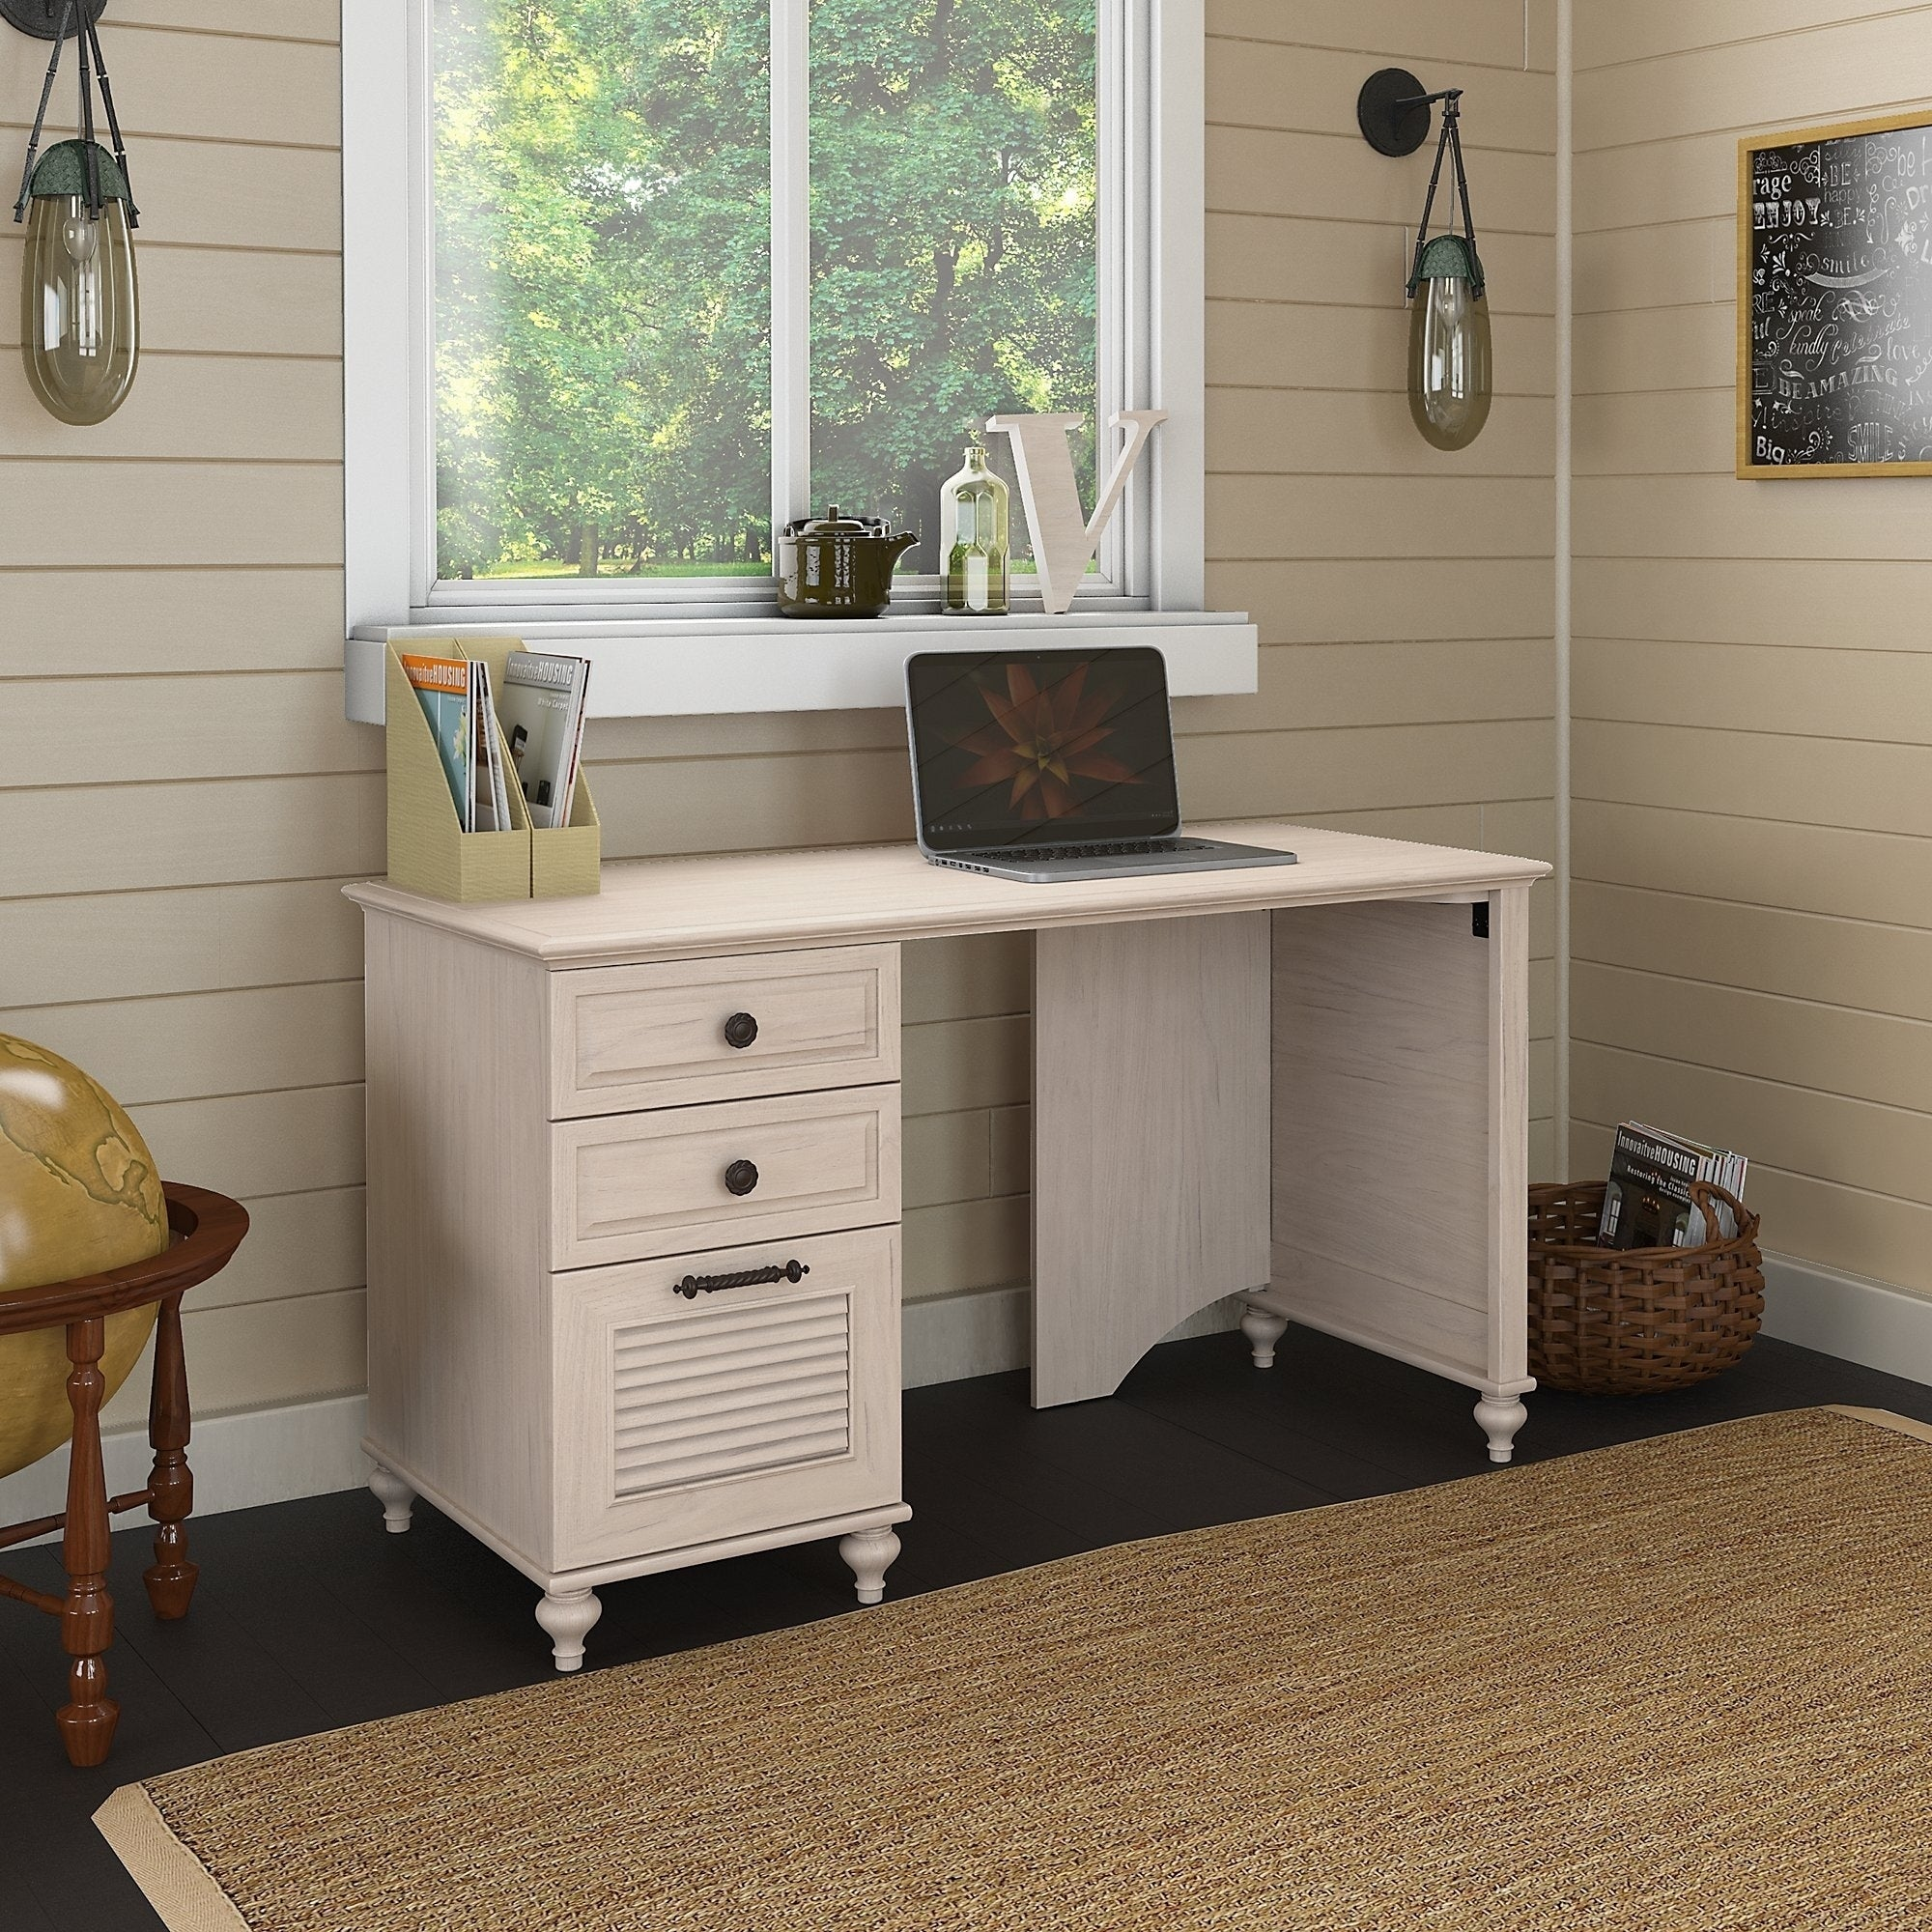 Shop kathy ireland office volcano dusk desk 3 drawer pedestal free shipping today overstock com 9627962